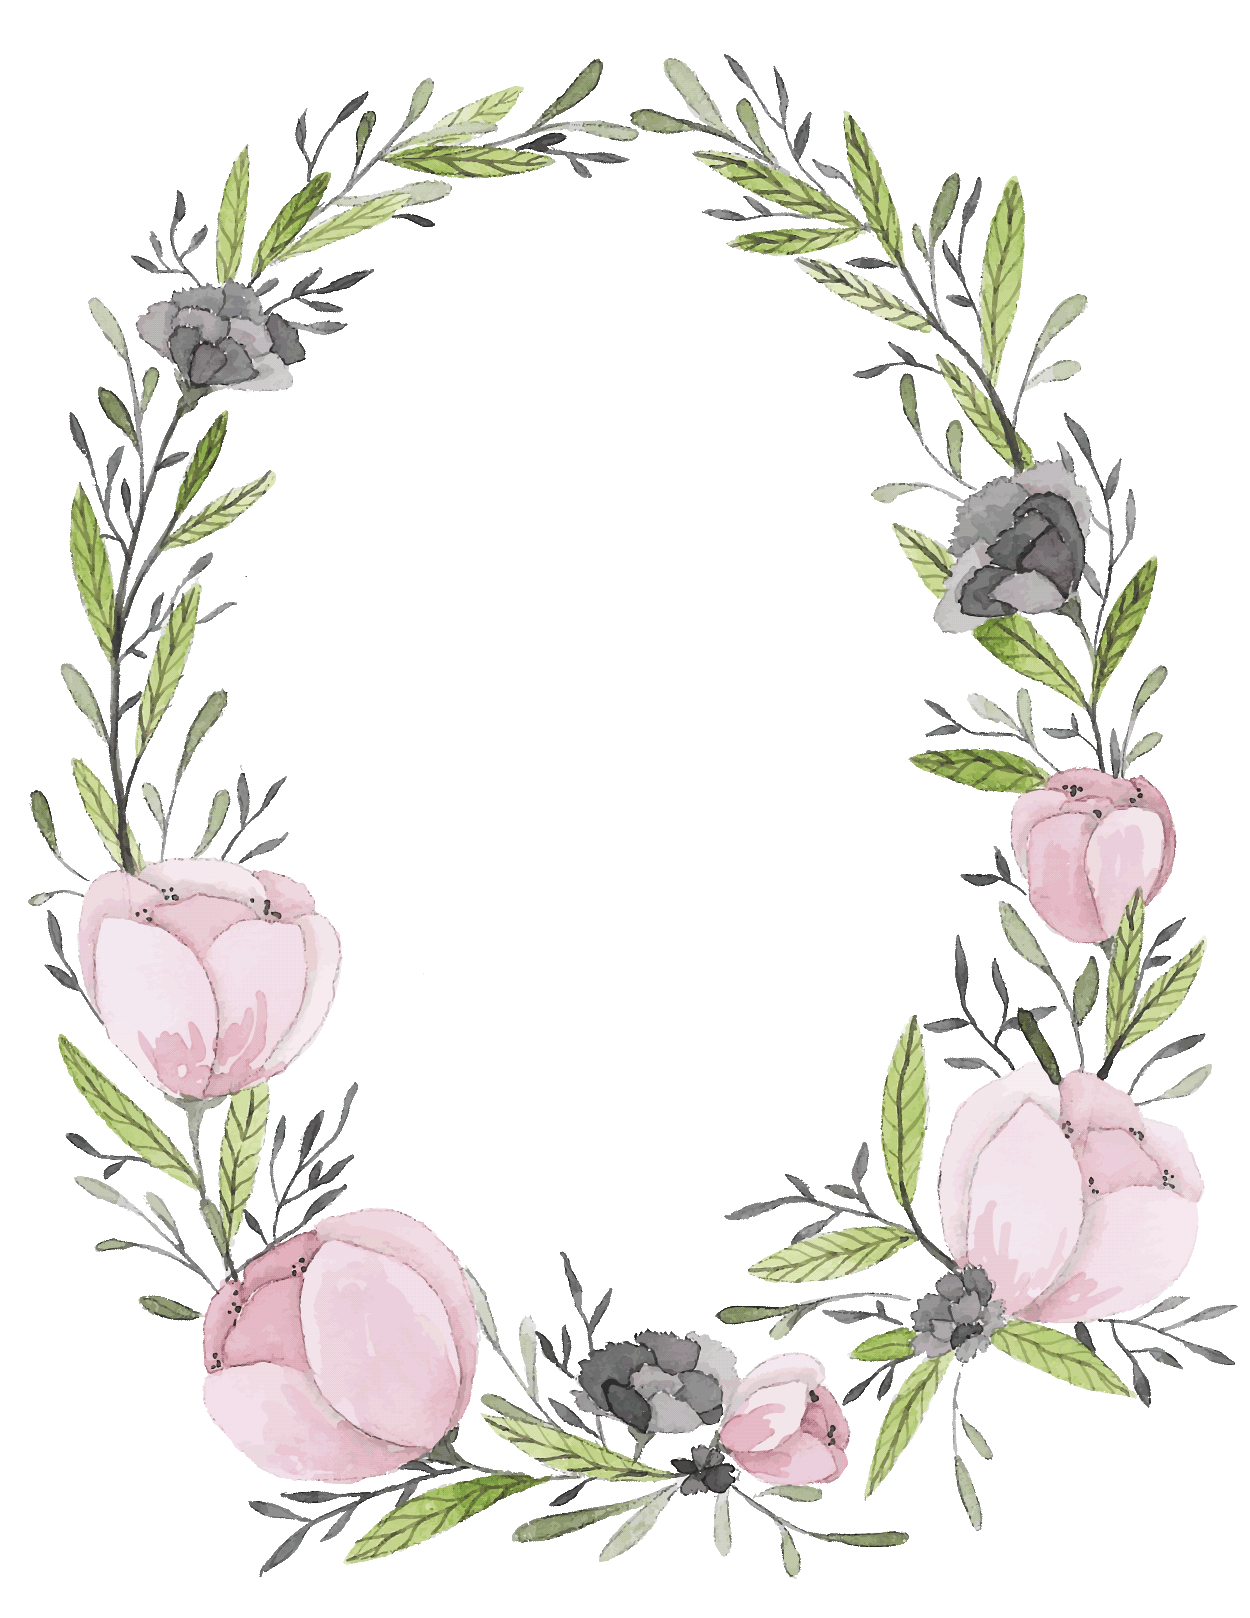 Im genes para invitaciones. Banner clip art flower